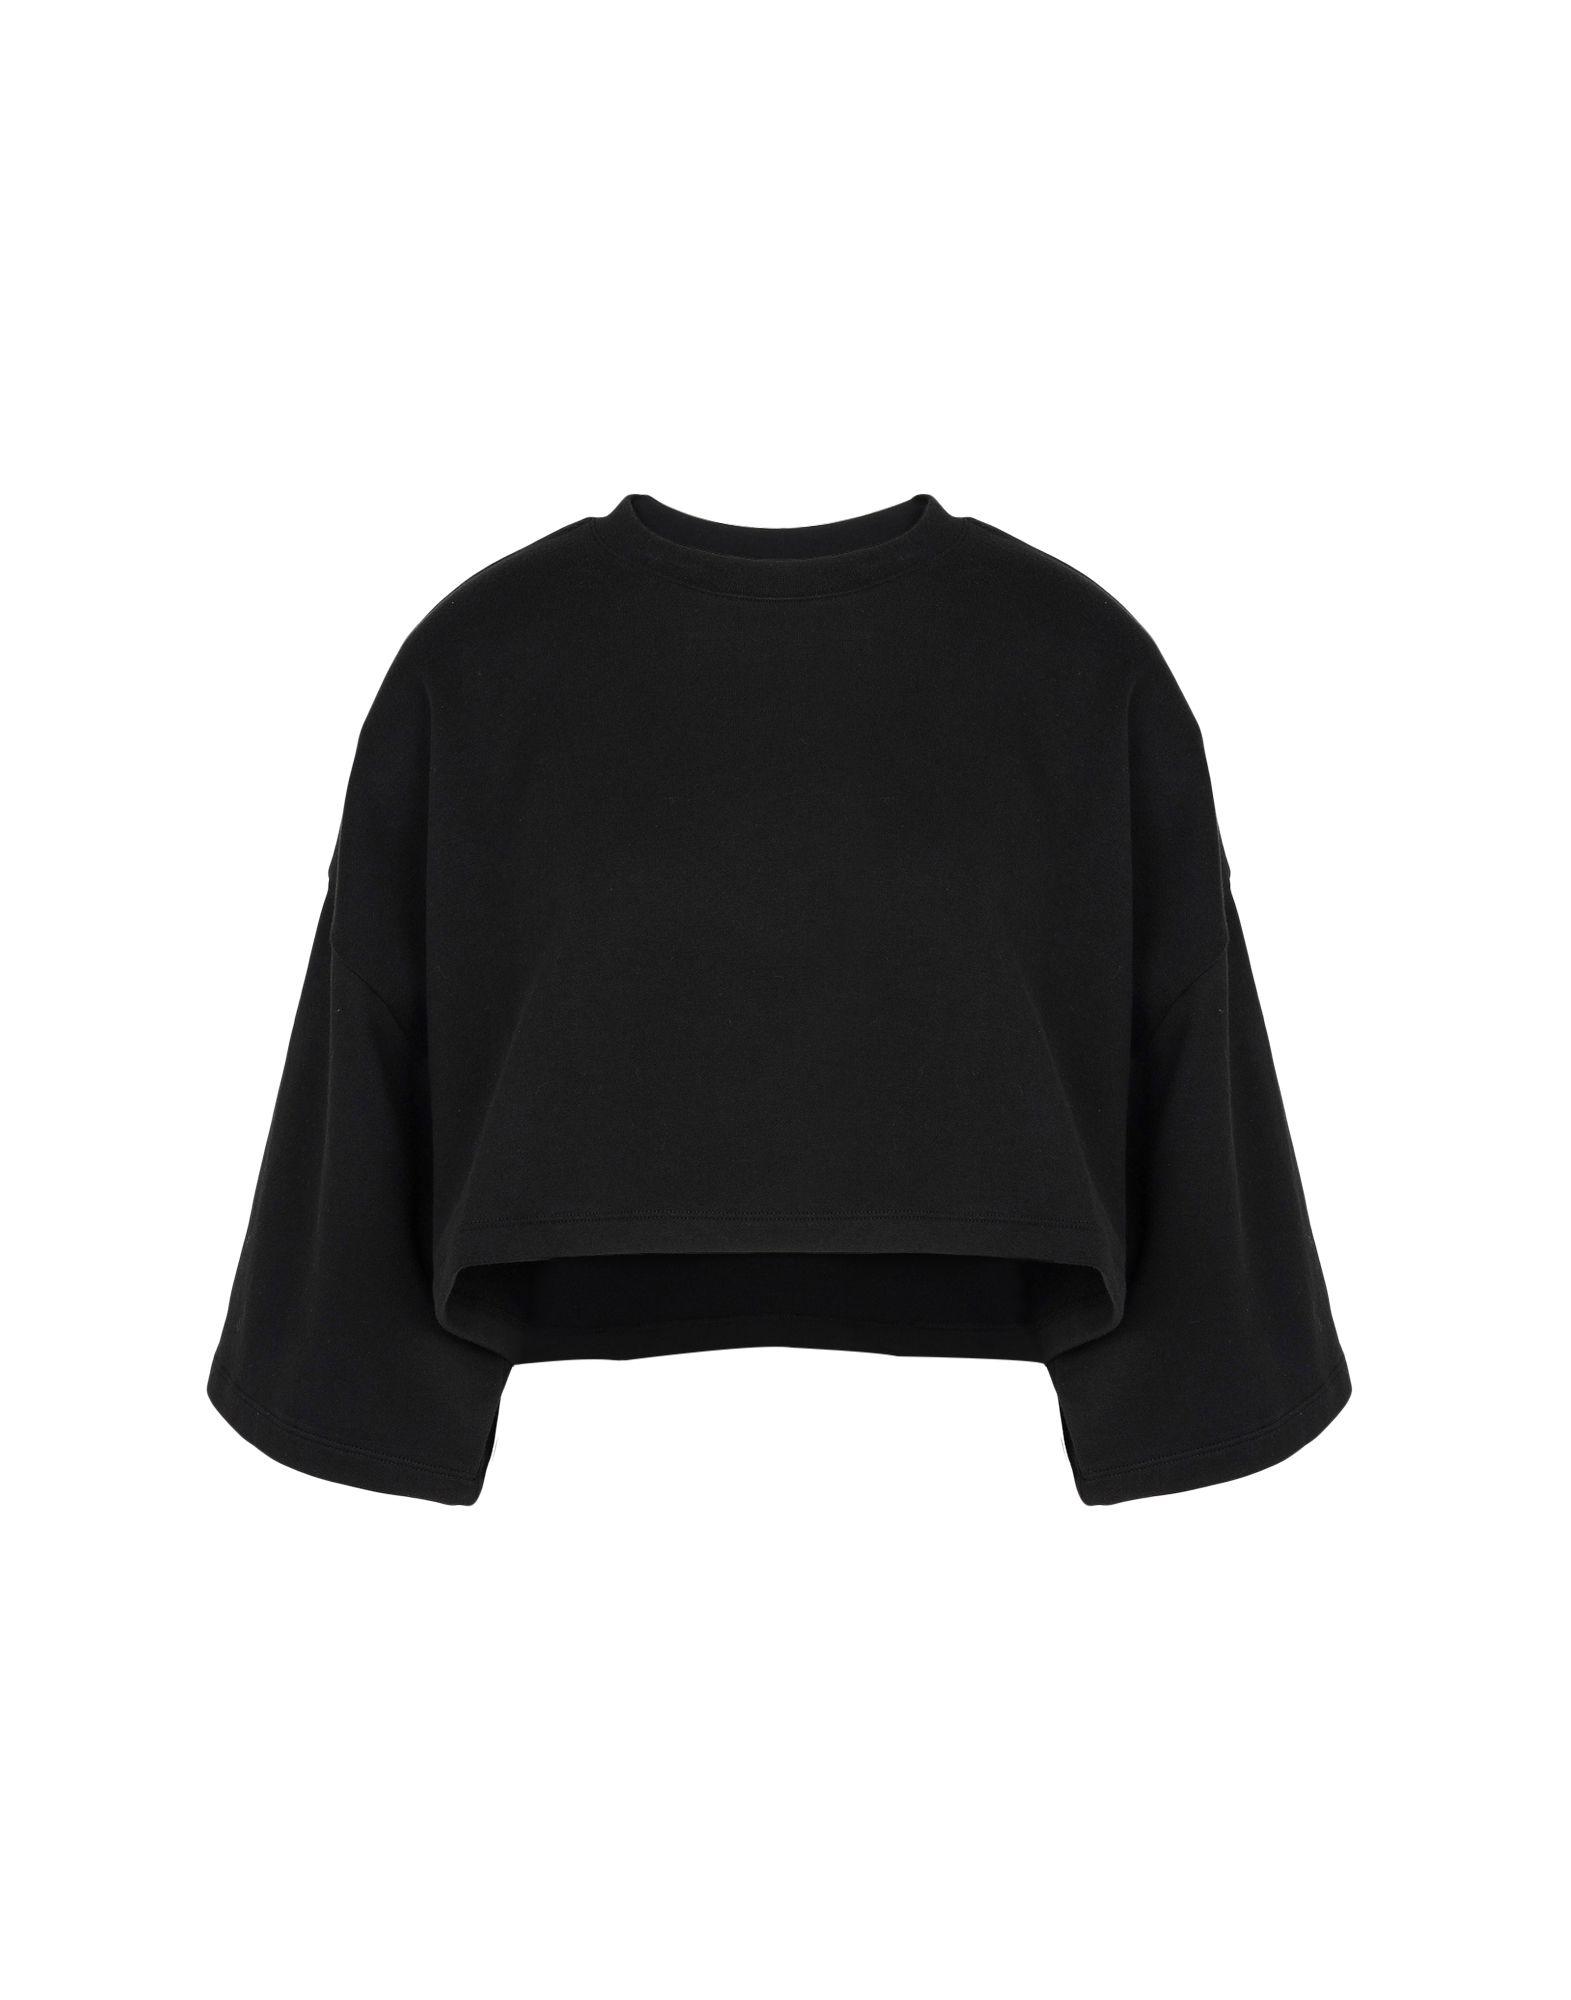 outlet store 83478 dc13c FENTY PUMA by RIHANNA Sweatshirt - Jumpers and Sweatshirts | YOOX.COM